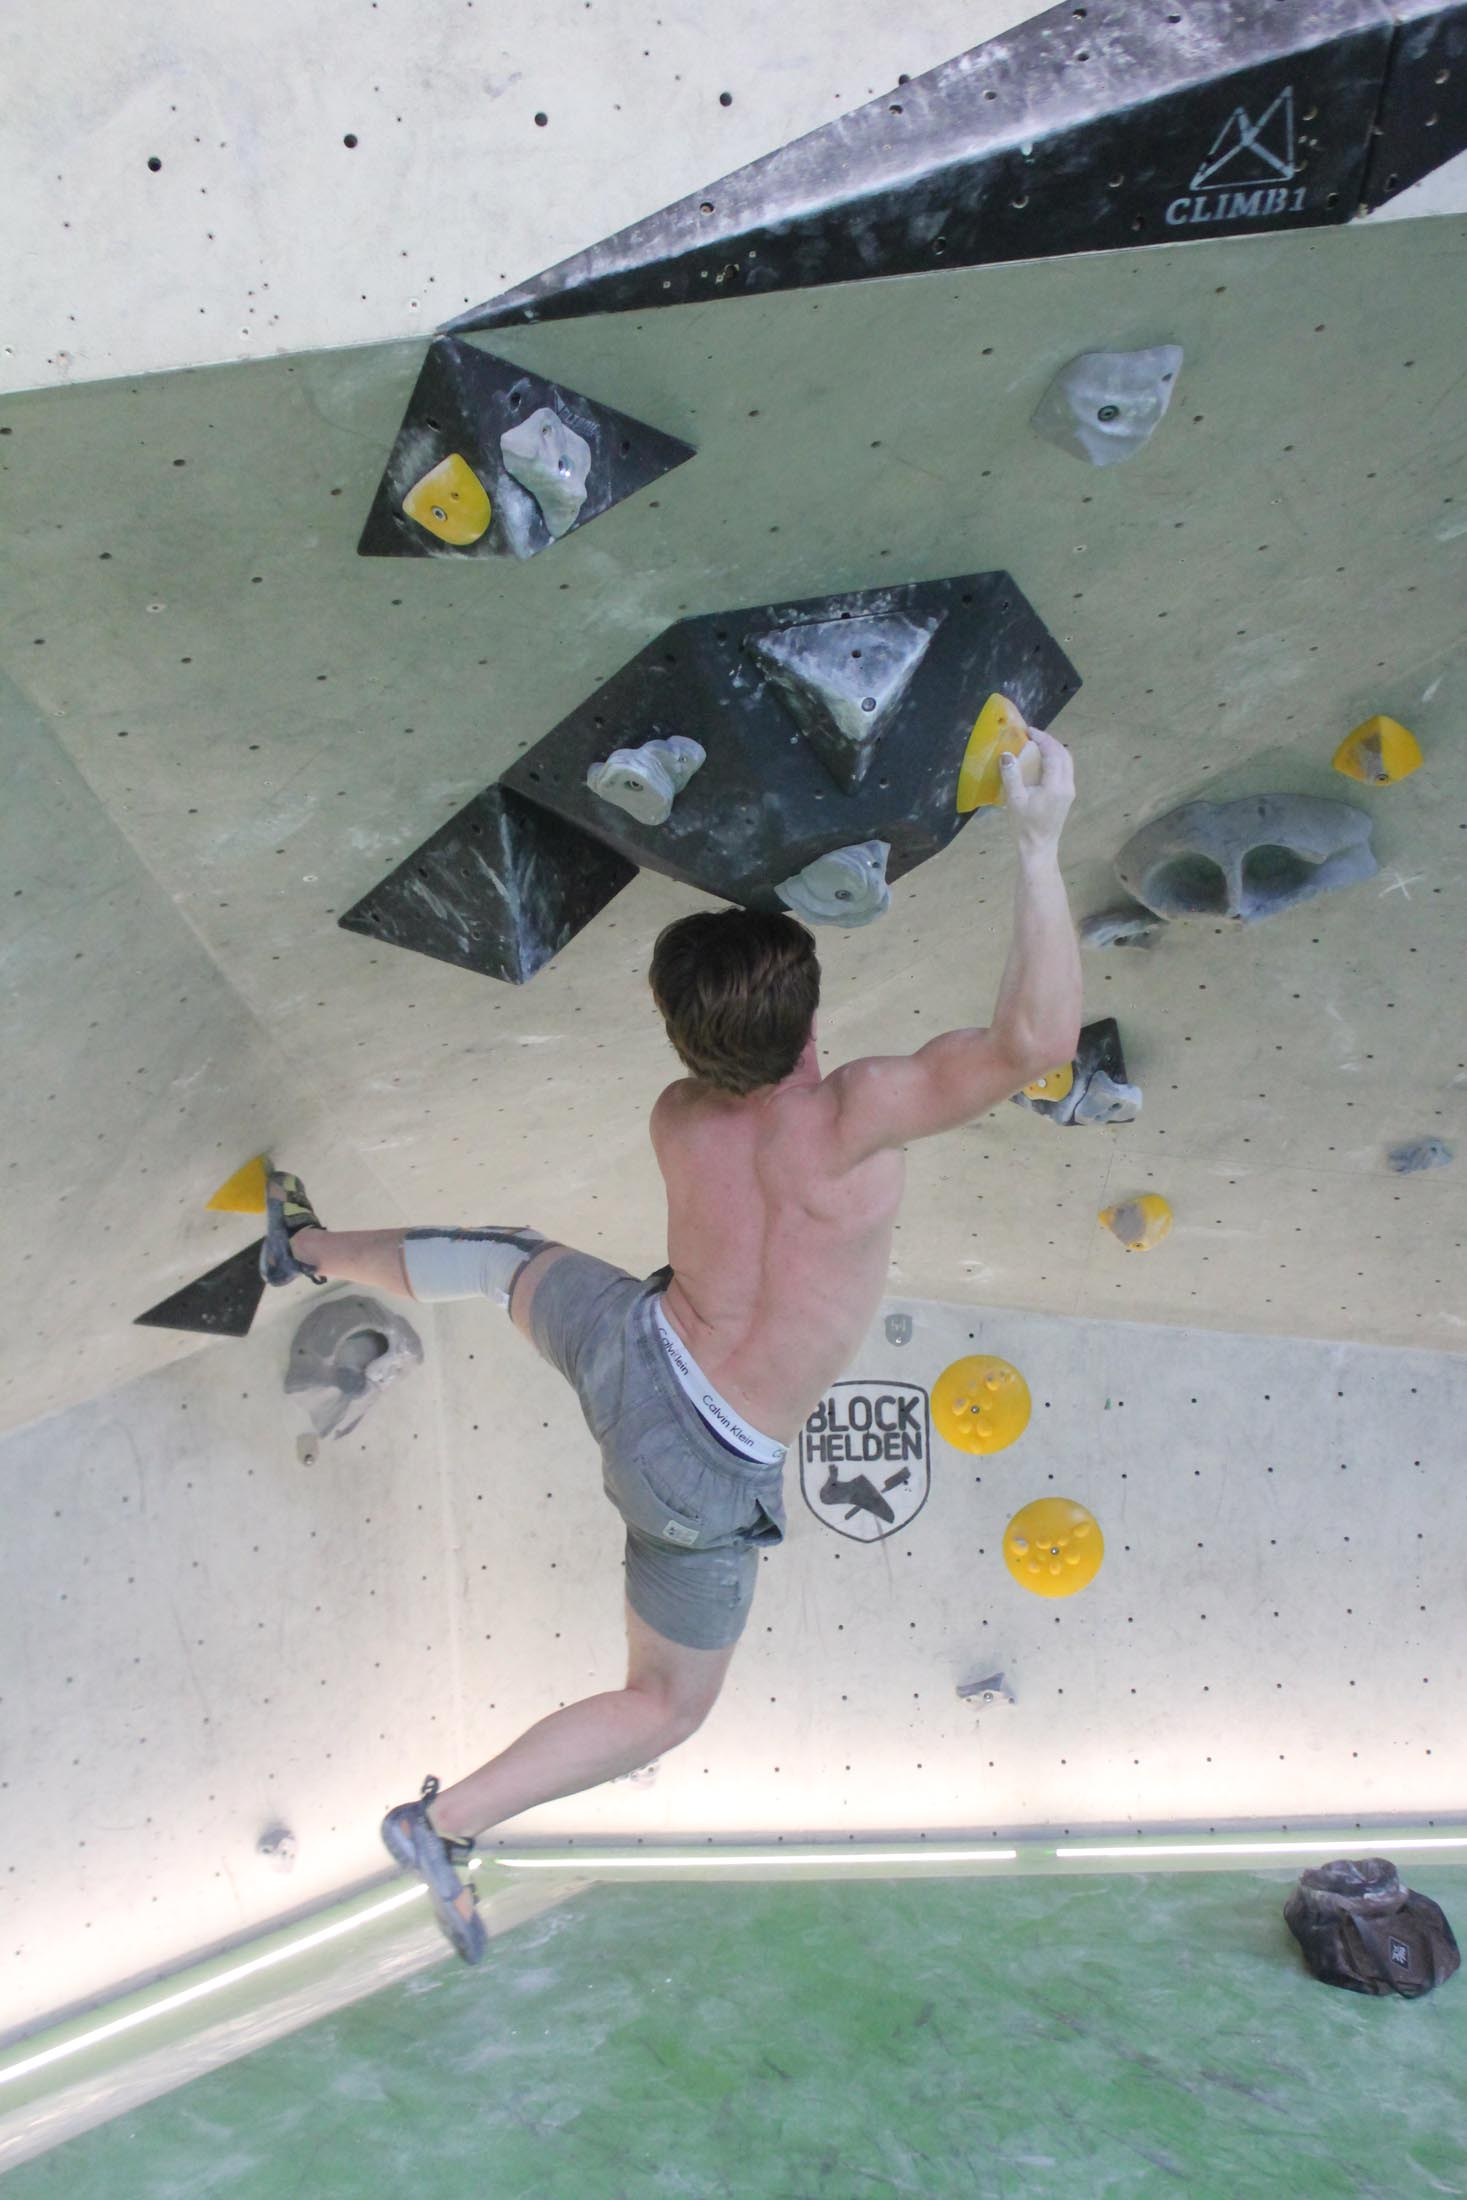 Quali, internationaler bouldercup Frankenjura 2016, BLOCKHELDEN Erlangen, Mammut, Bergfreunde.de, Boulderwettkampf07092016270